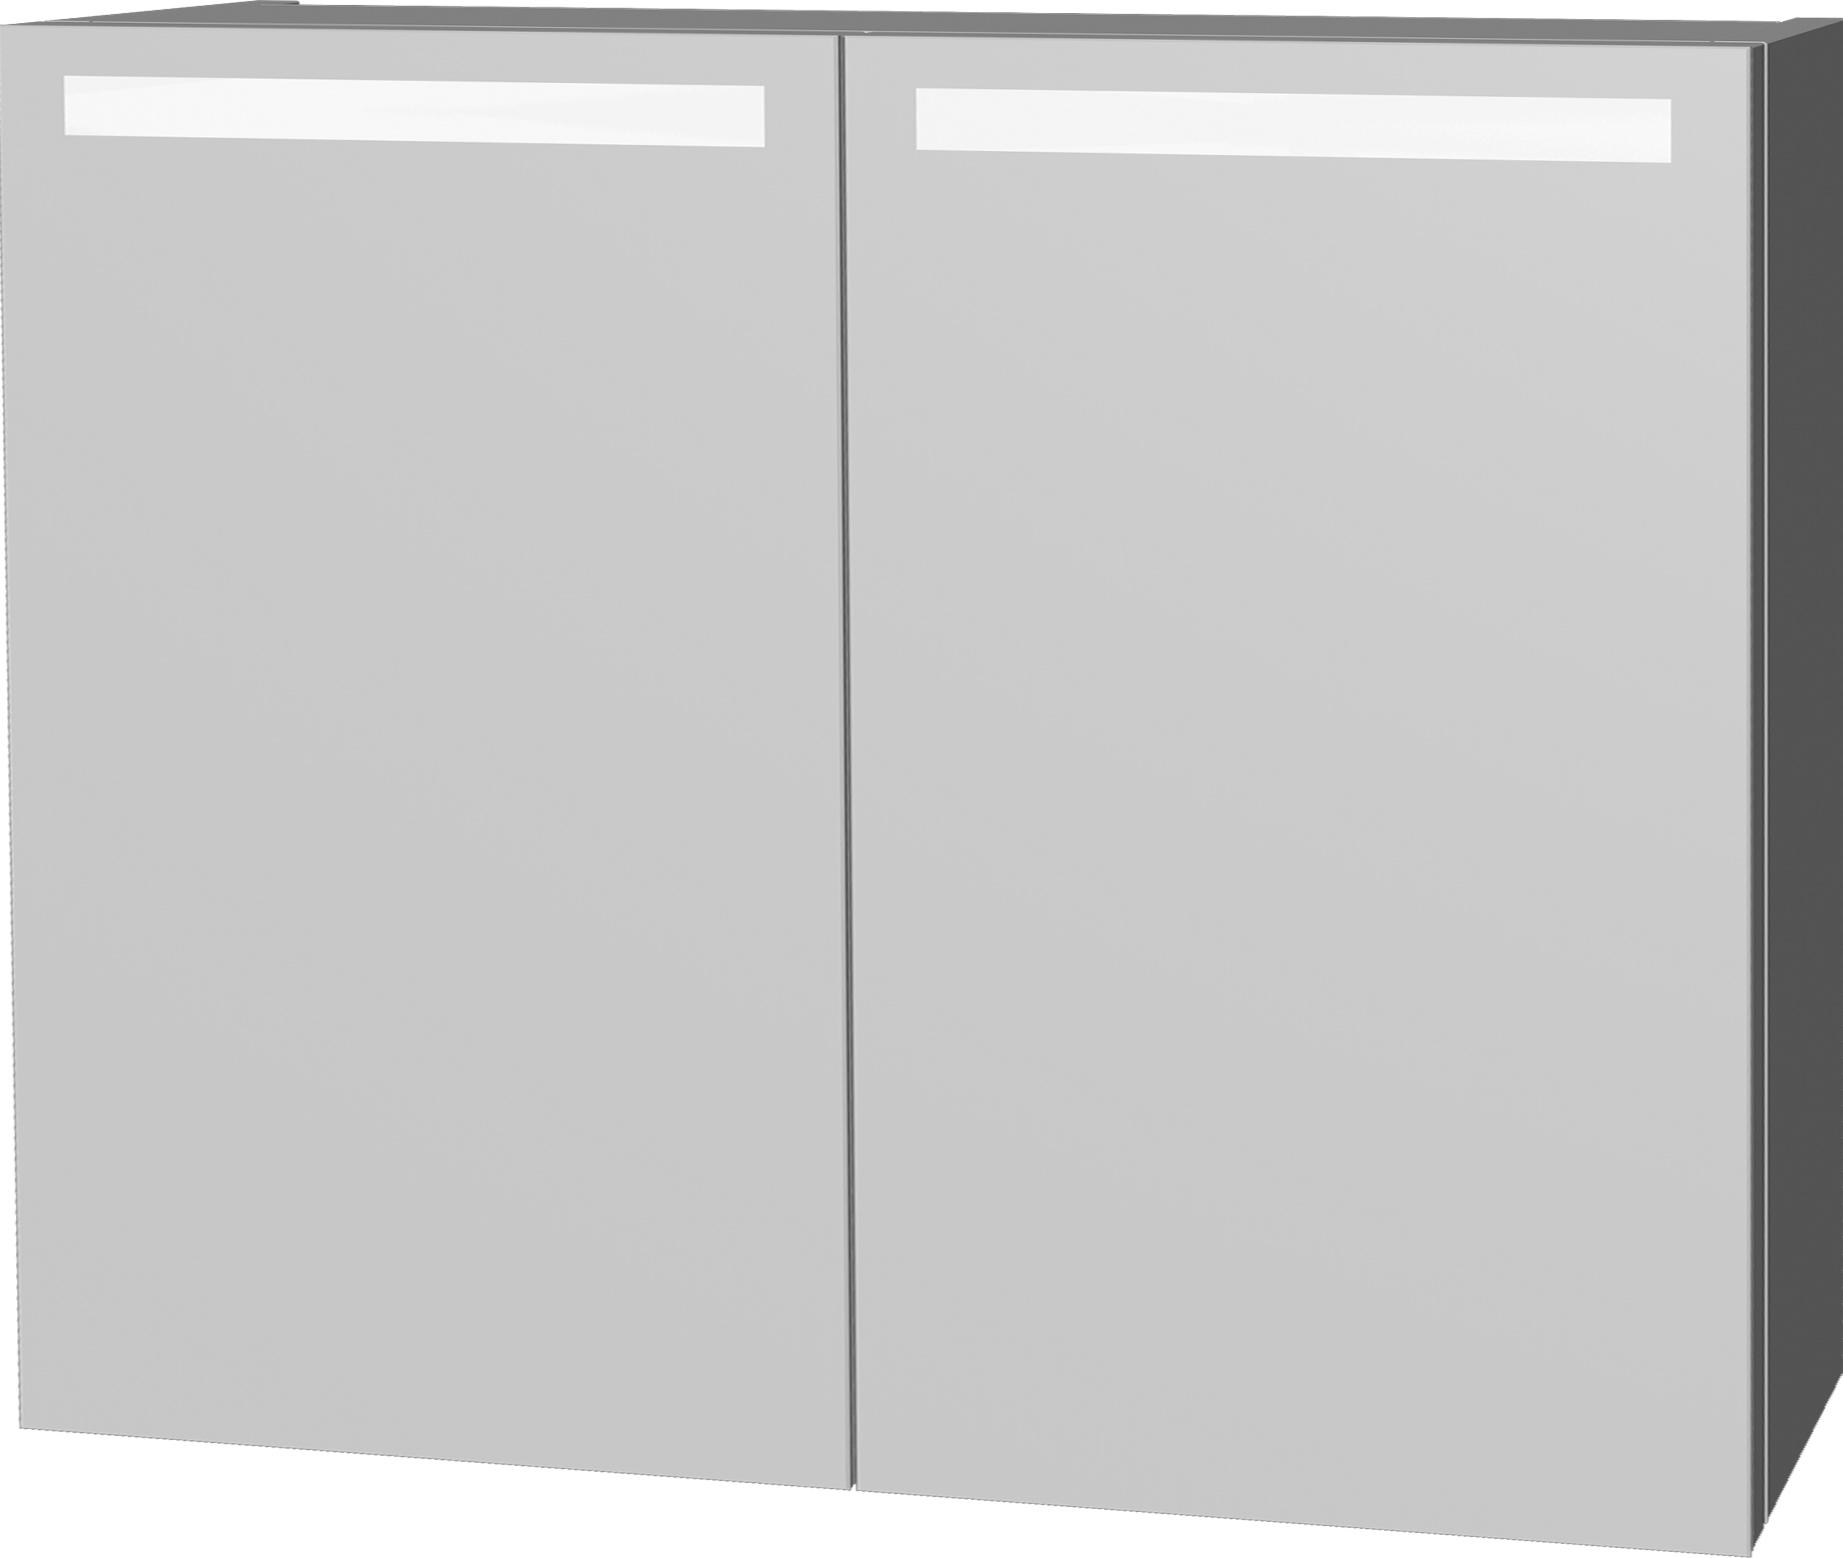 Intedoor Zrcadlová skříňka 90x72 cm, s osvětlením DZS90